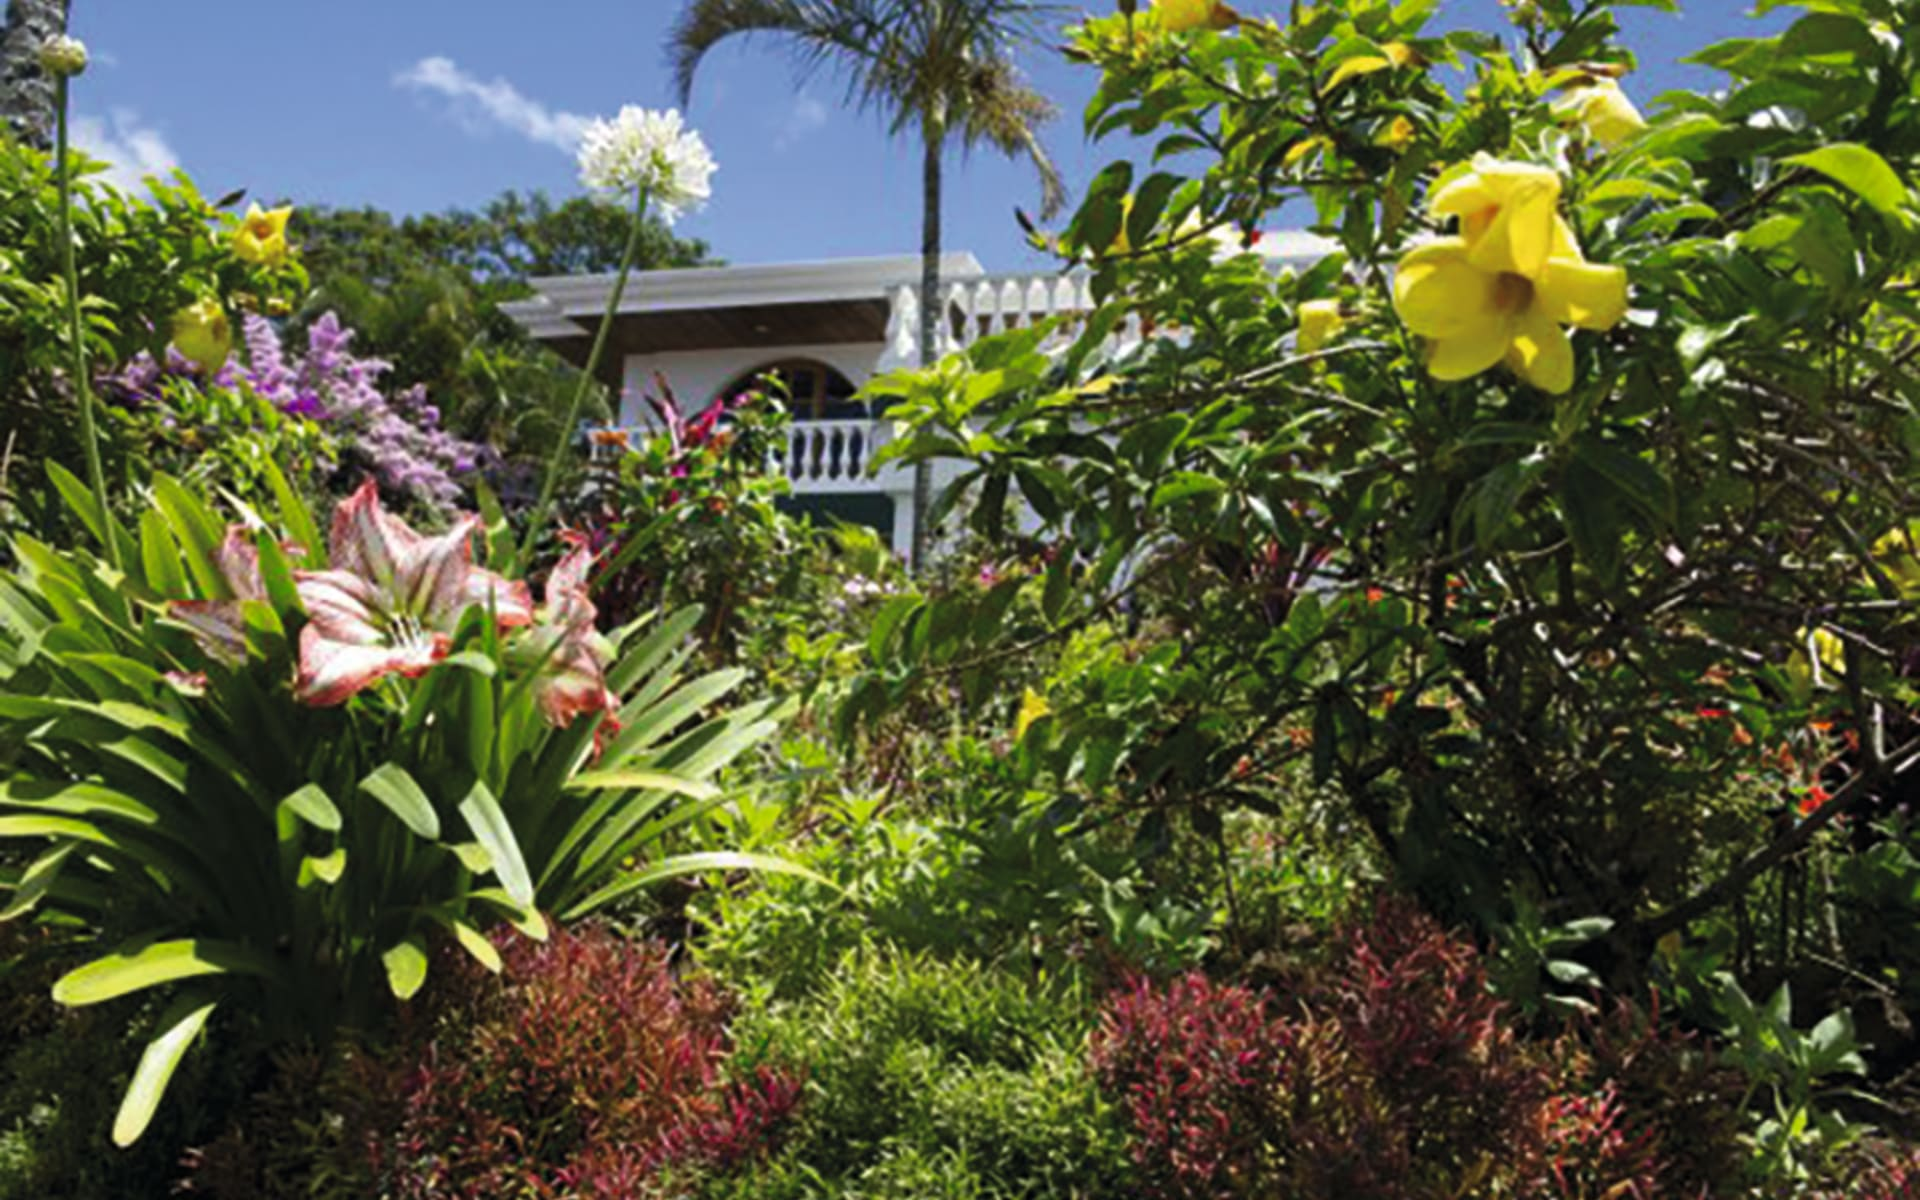 Buena Vista in Alajuela: natur hotel buena vista pflanzen